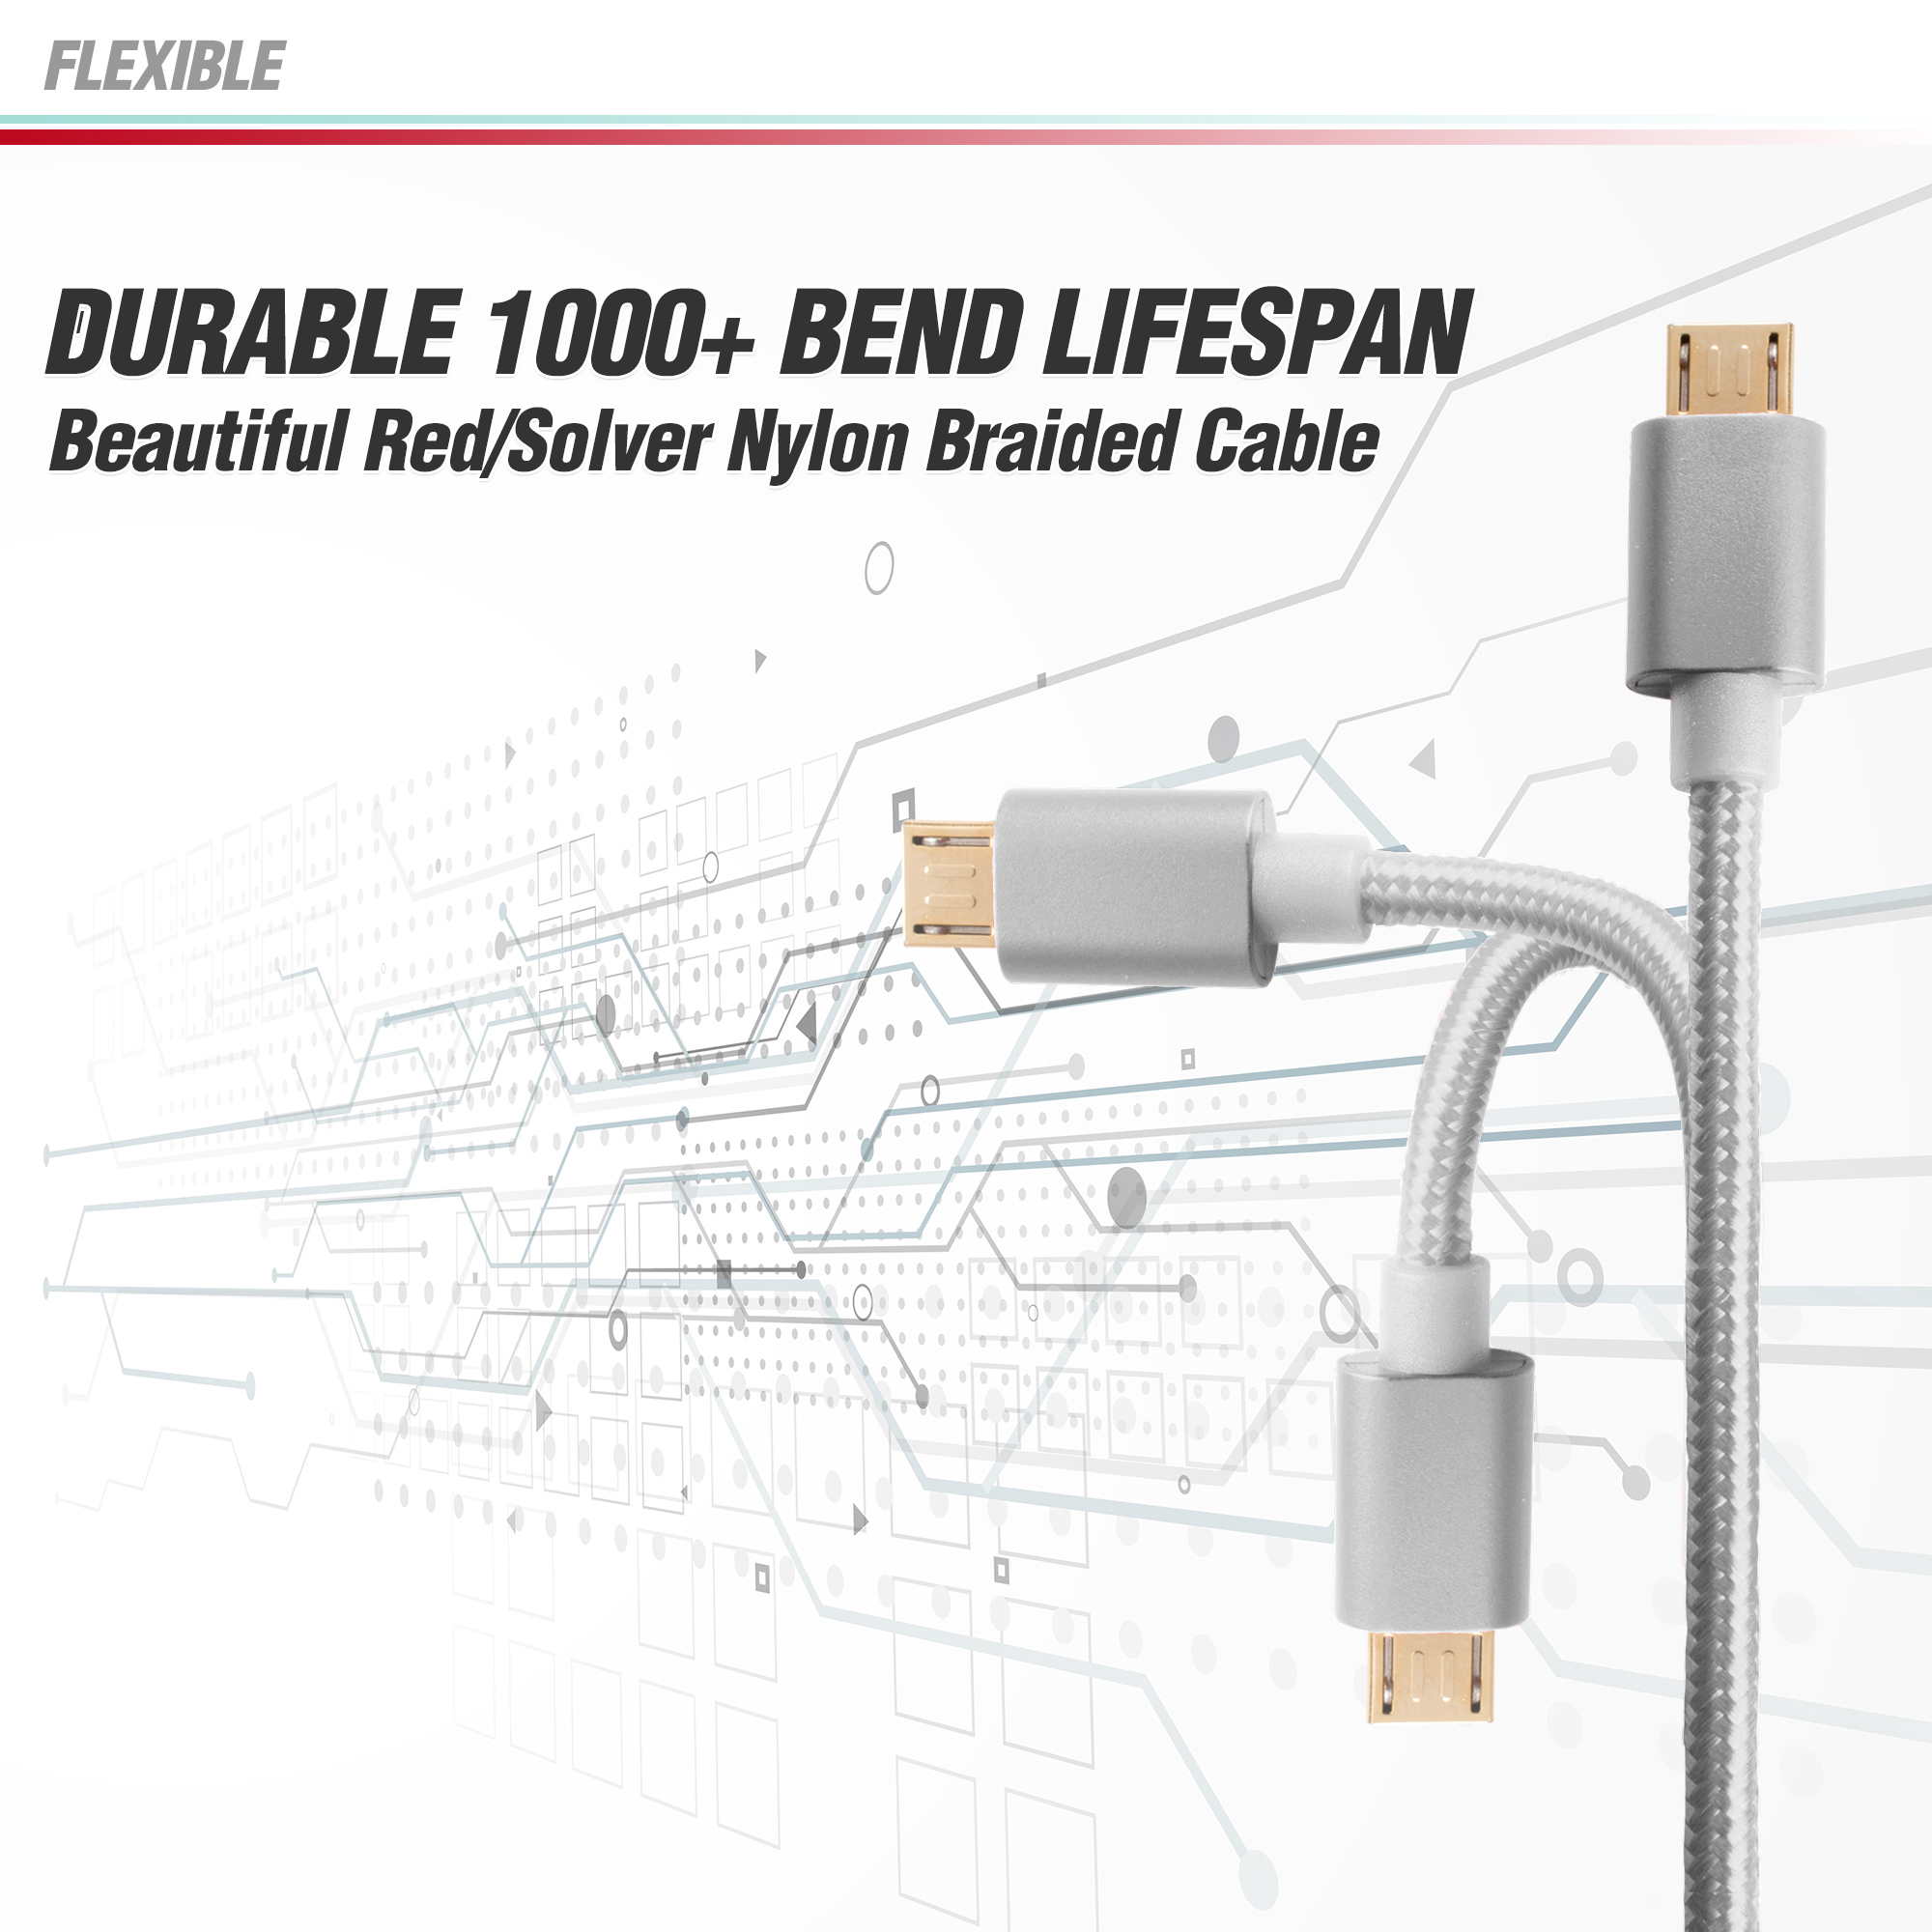 Xpro 215 ActionCam Data /& Charging USB Cable For Mediacom M SCXP215W